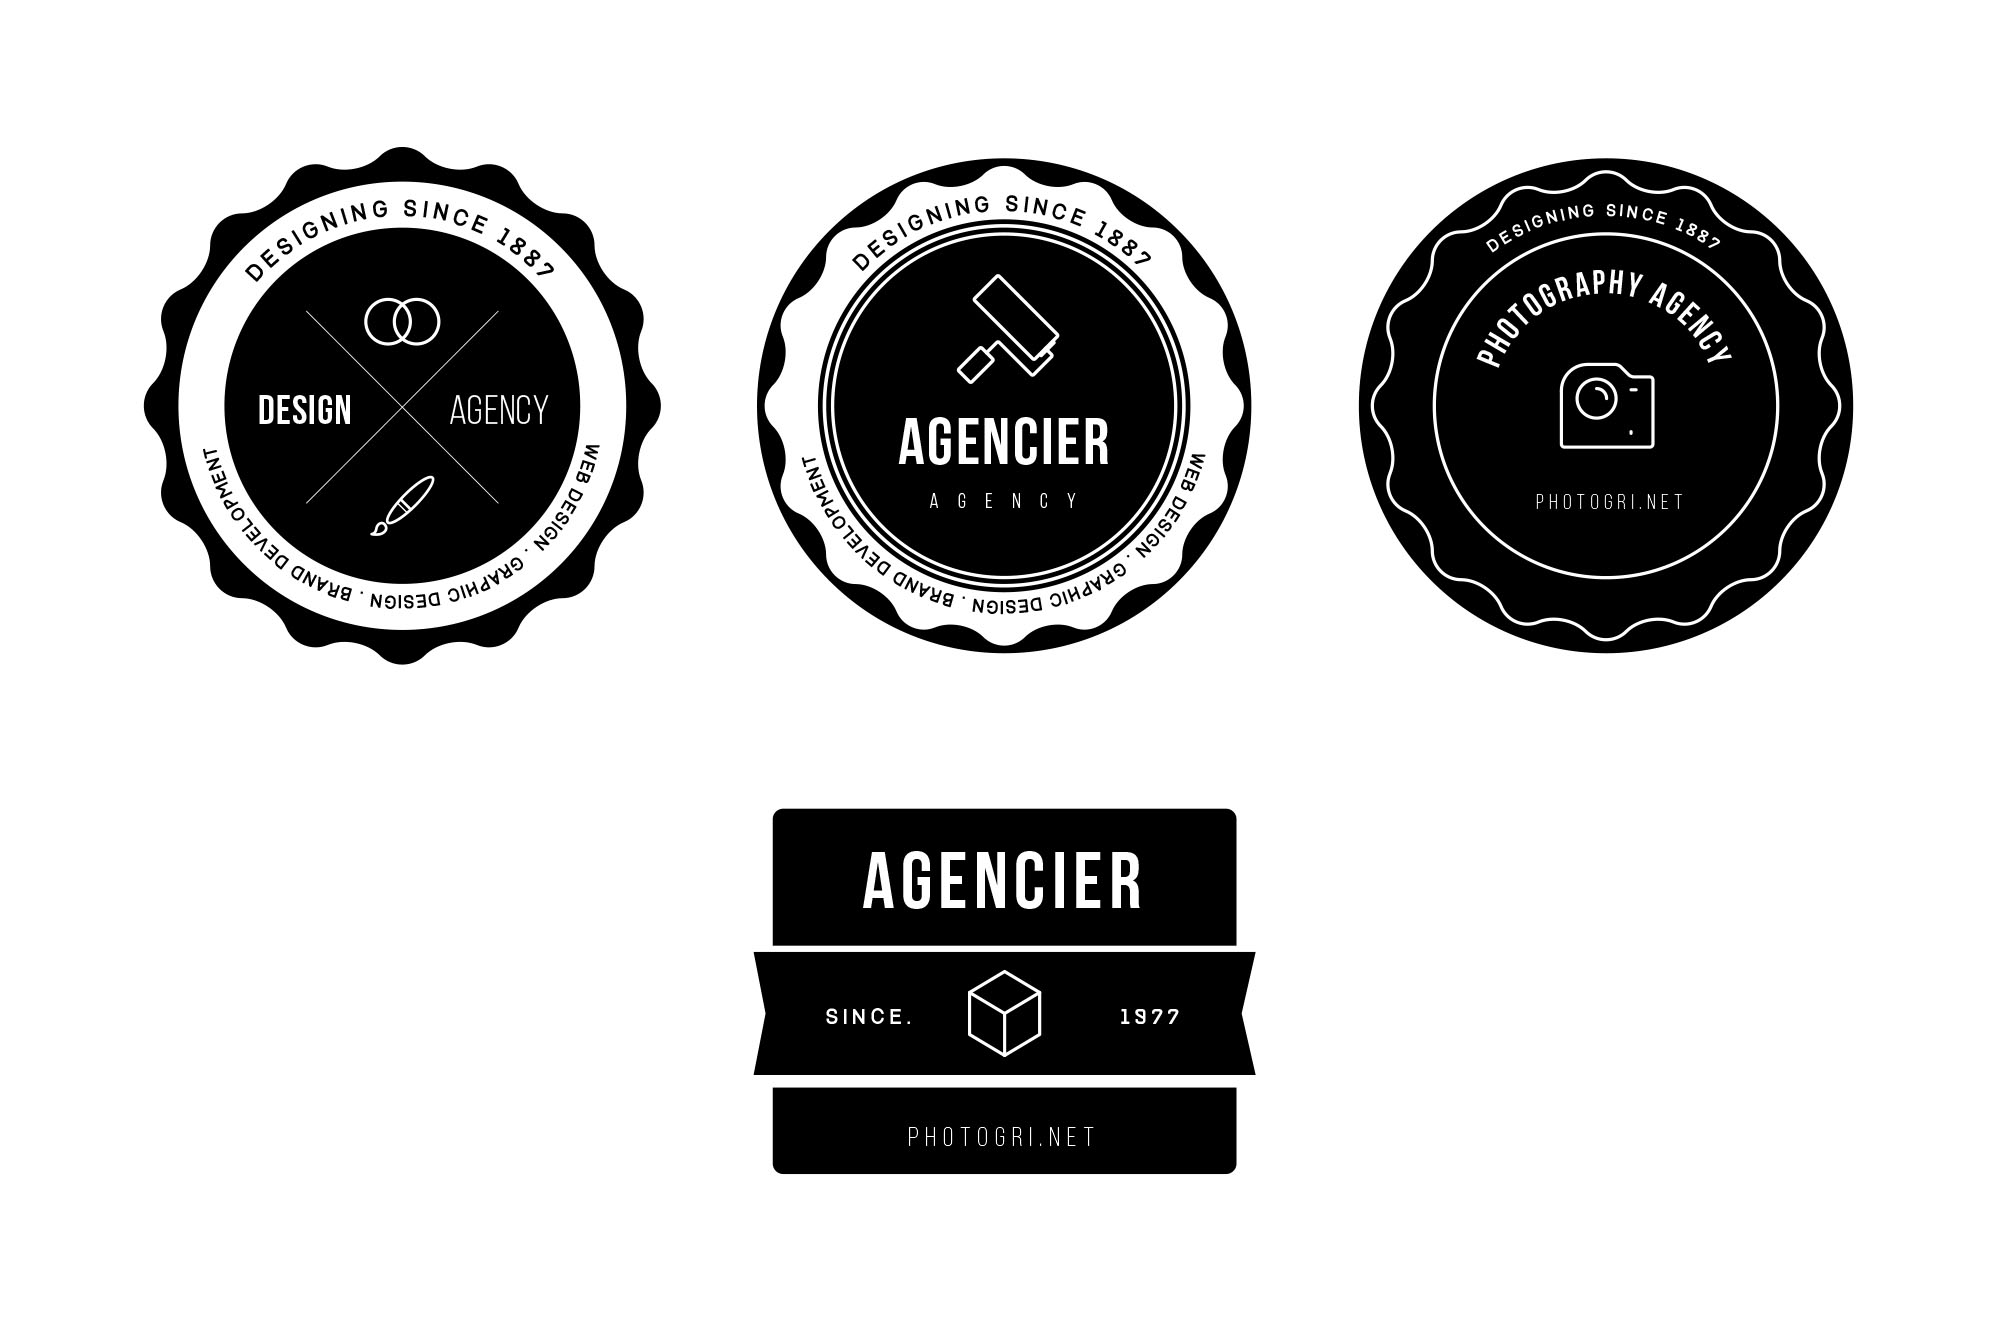 Agency Badges